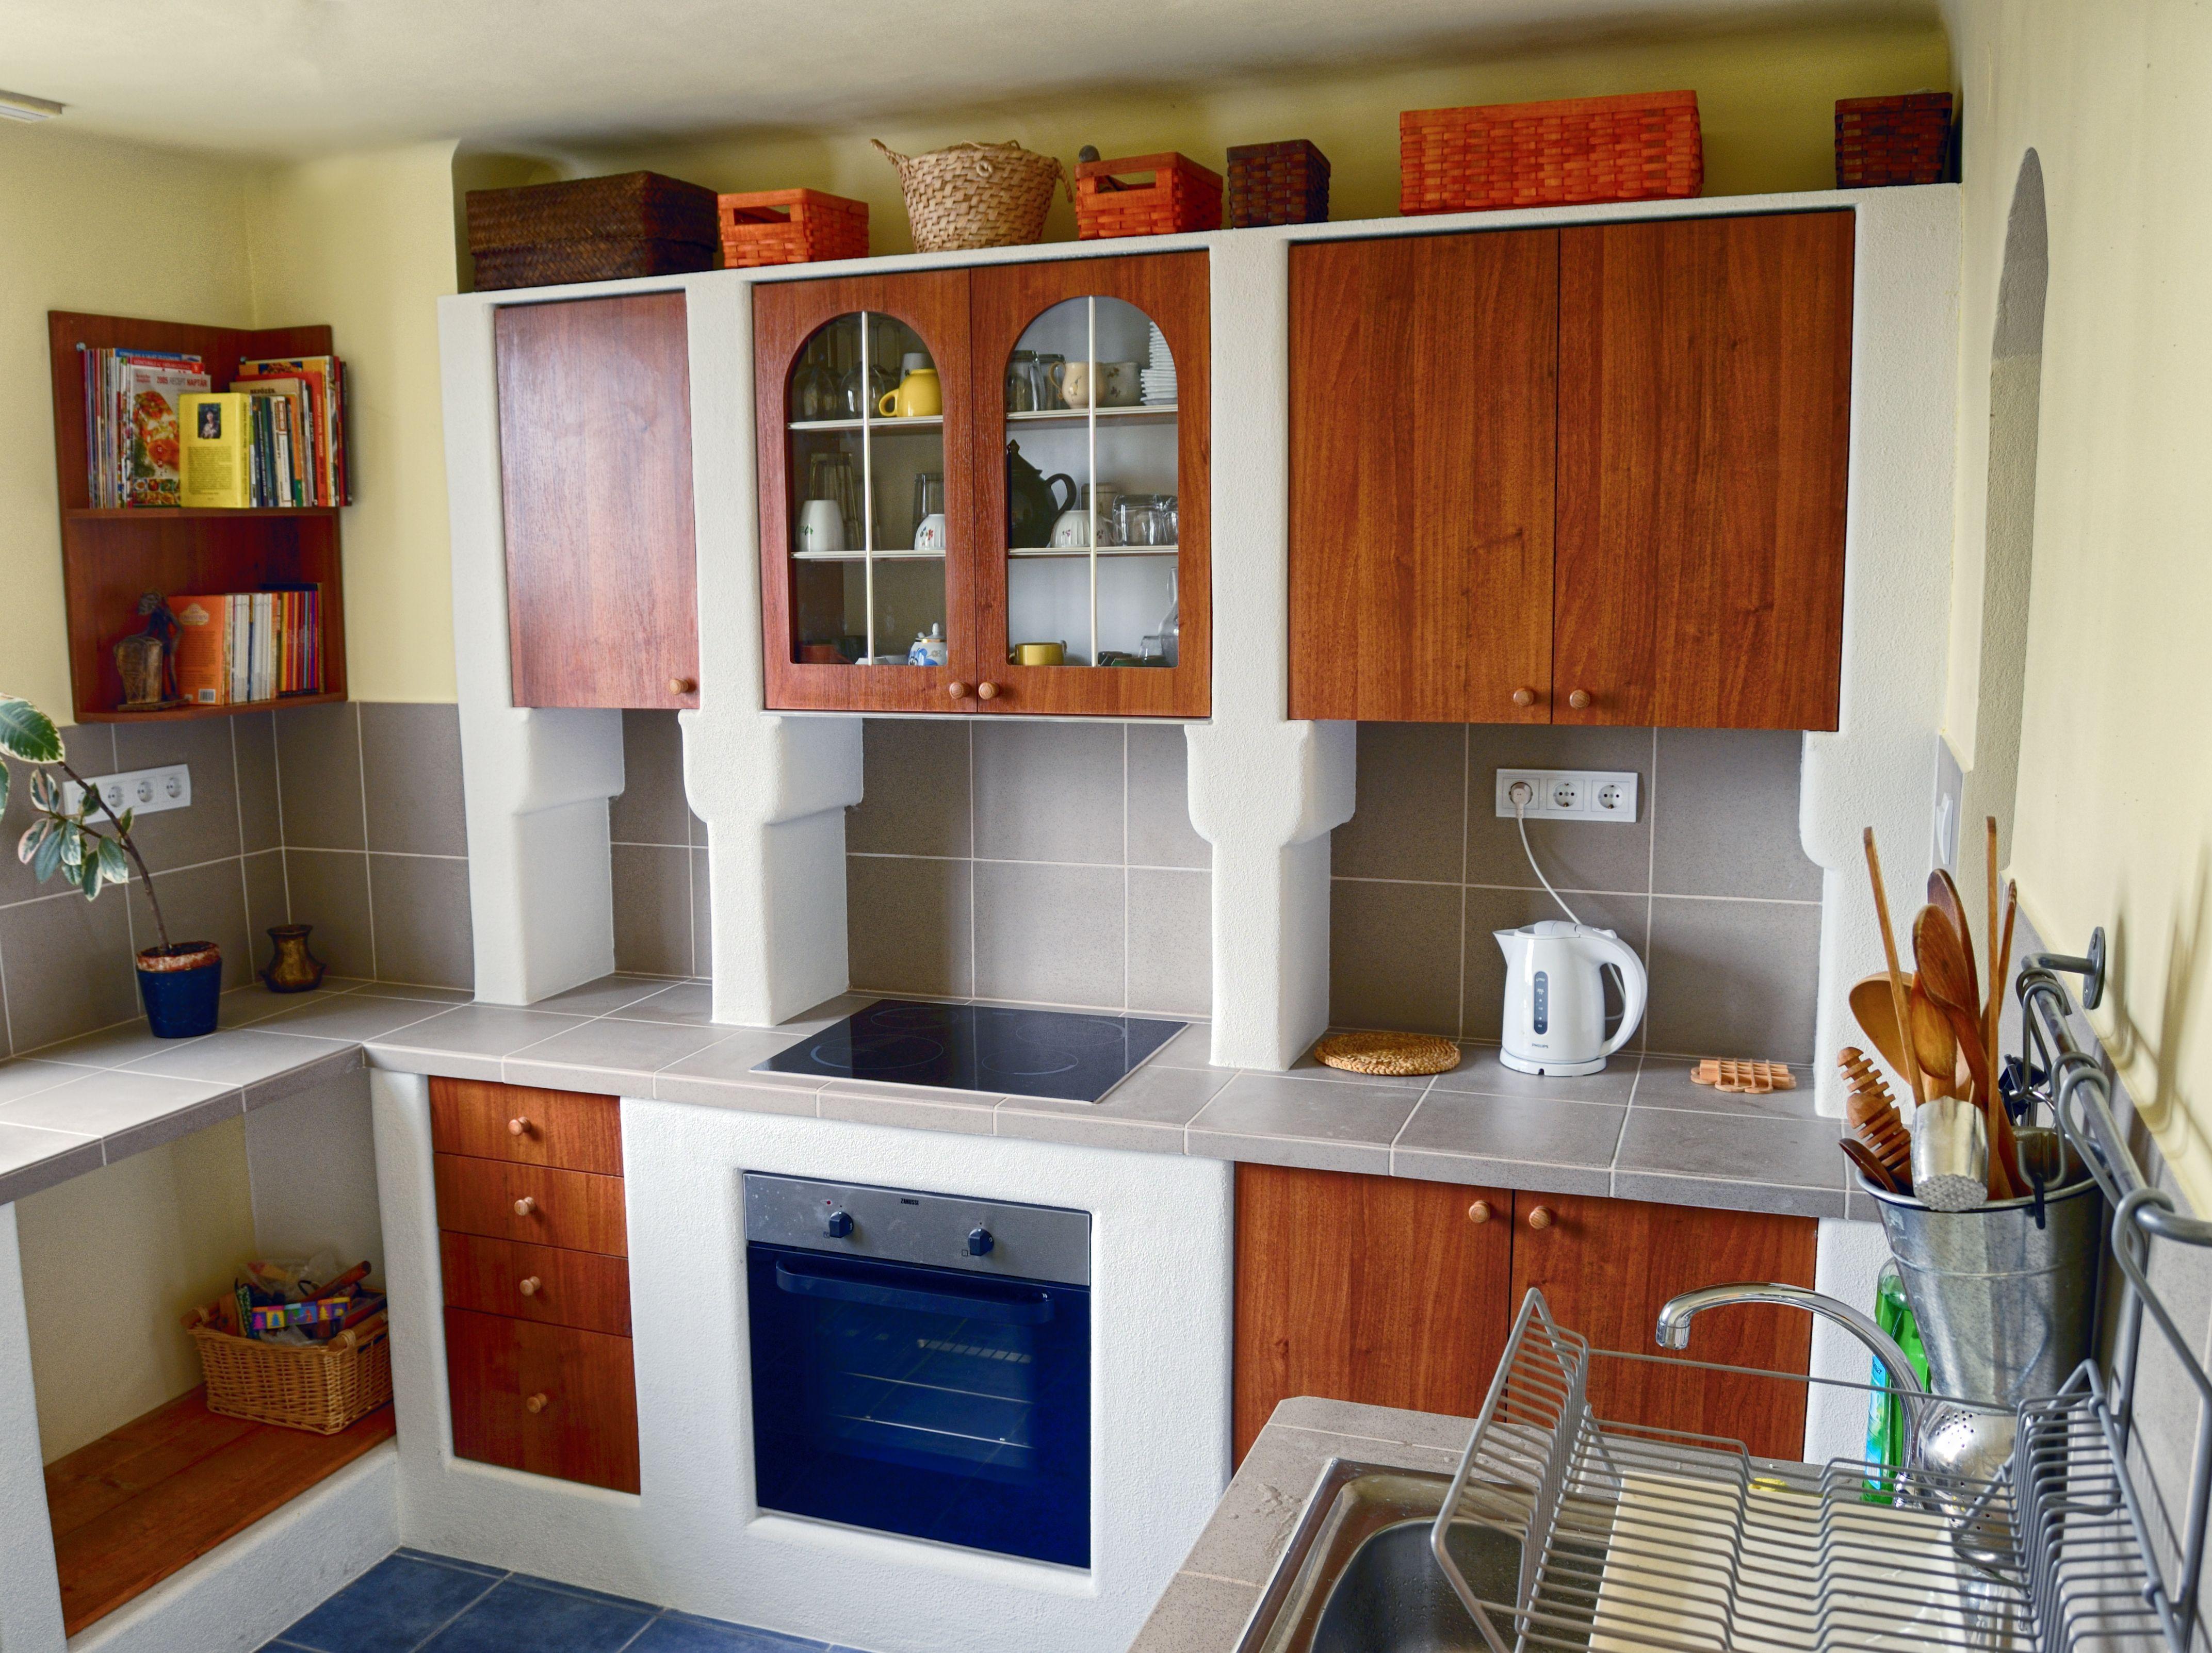 ytong kitchen 01 02 k chen pinterest ytong k che selber bauen ytong und diy ytong. Black Bedroom Furniture Sets. Home Design Ideas